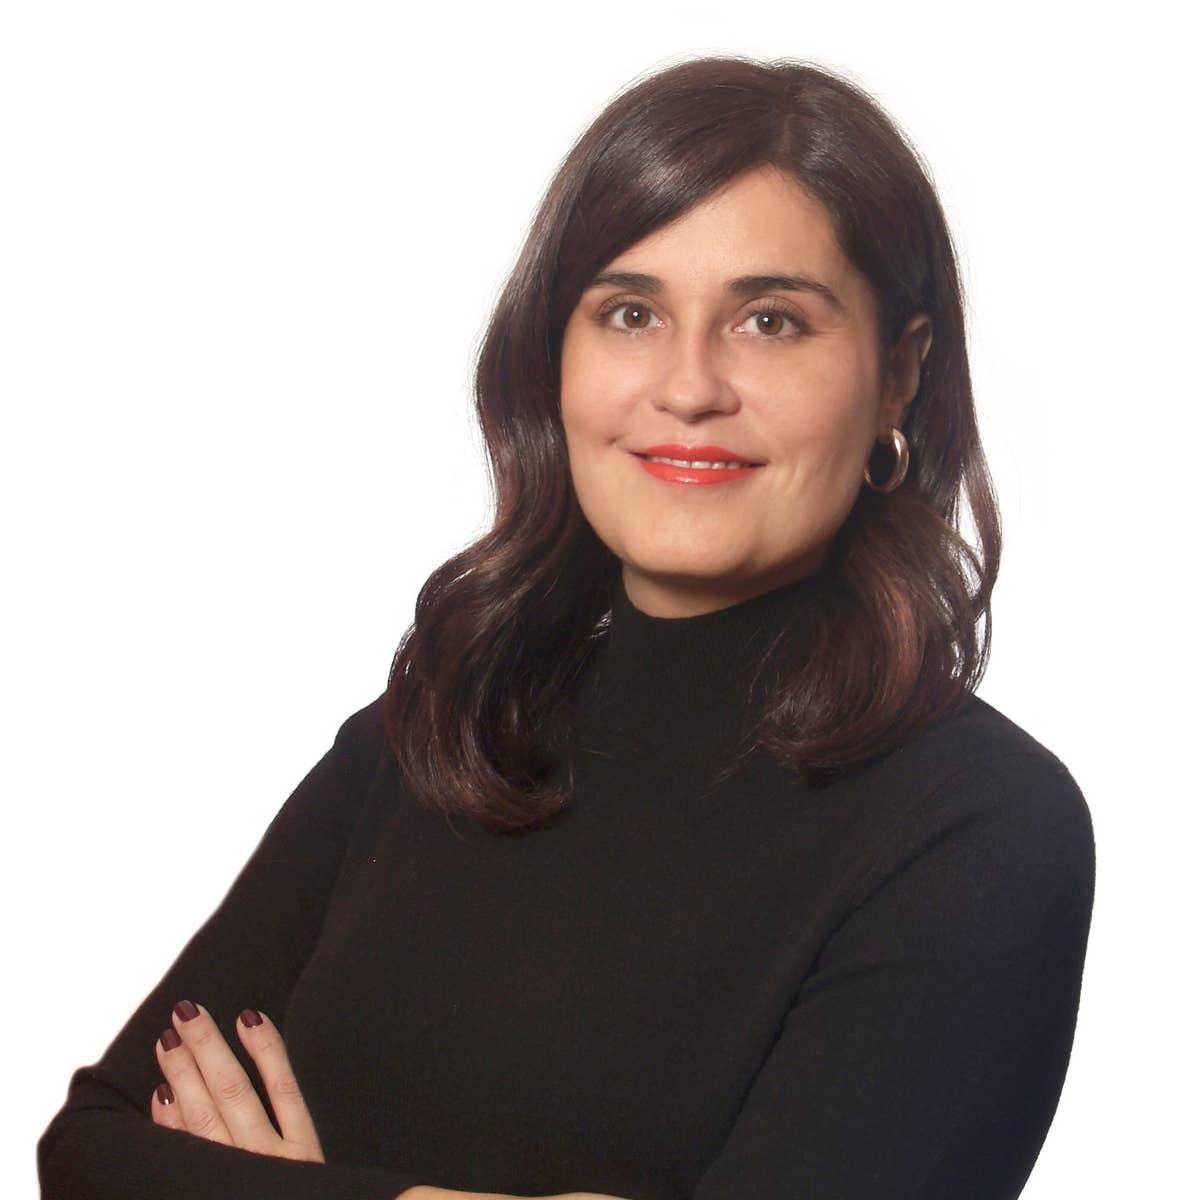 Ania Novoa